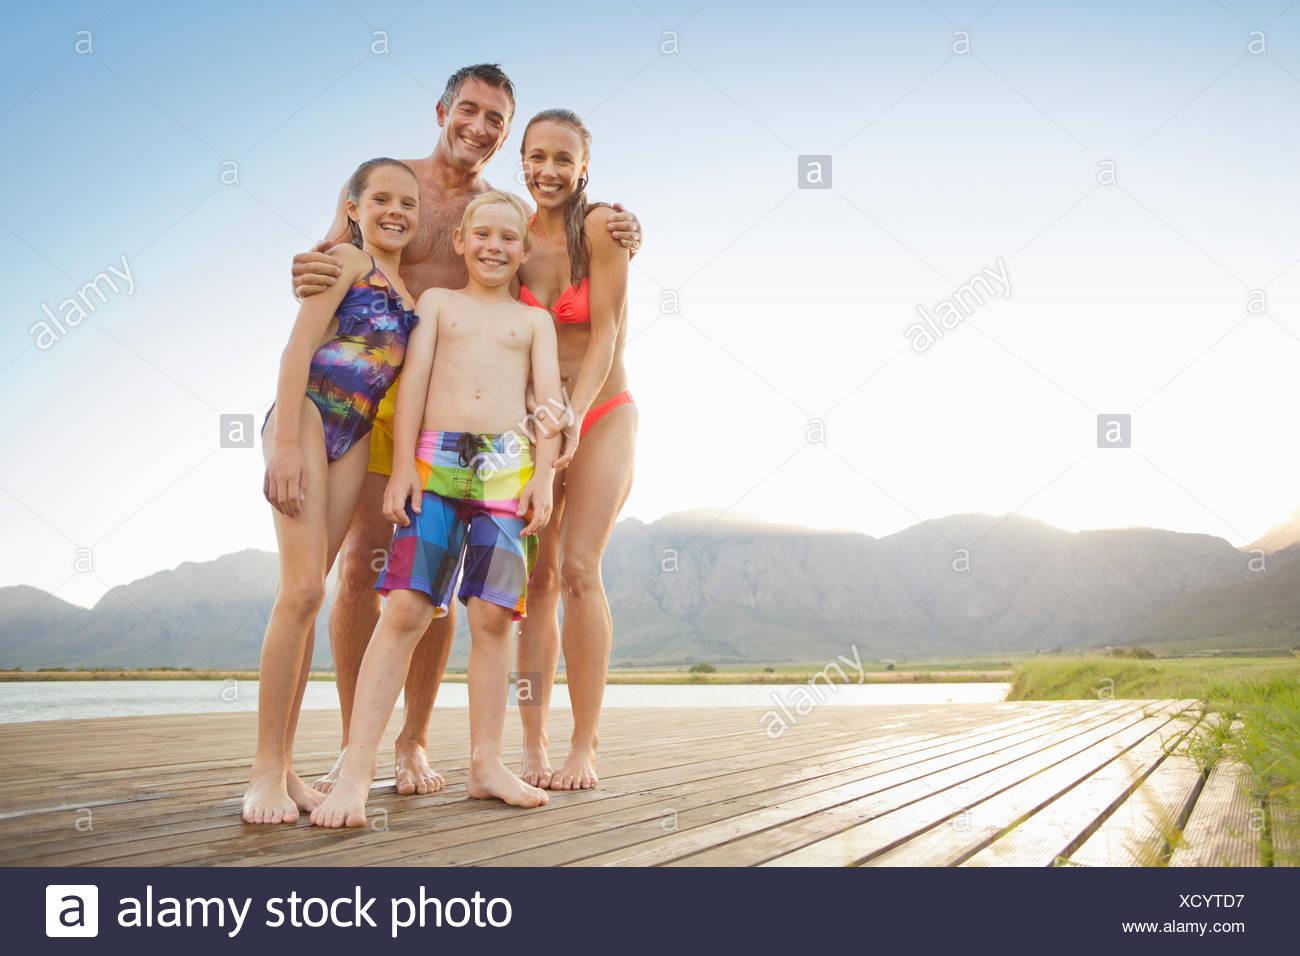 Family in swimwear on wooden jetty - Stock Image